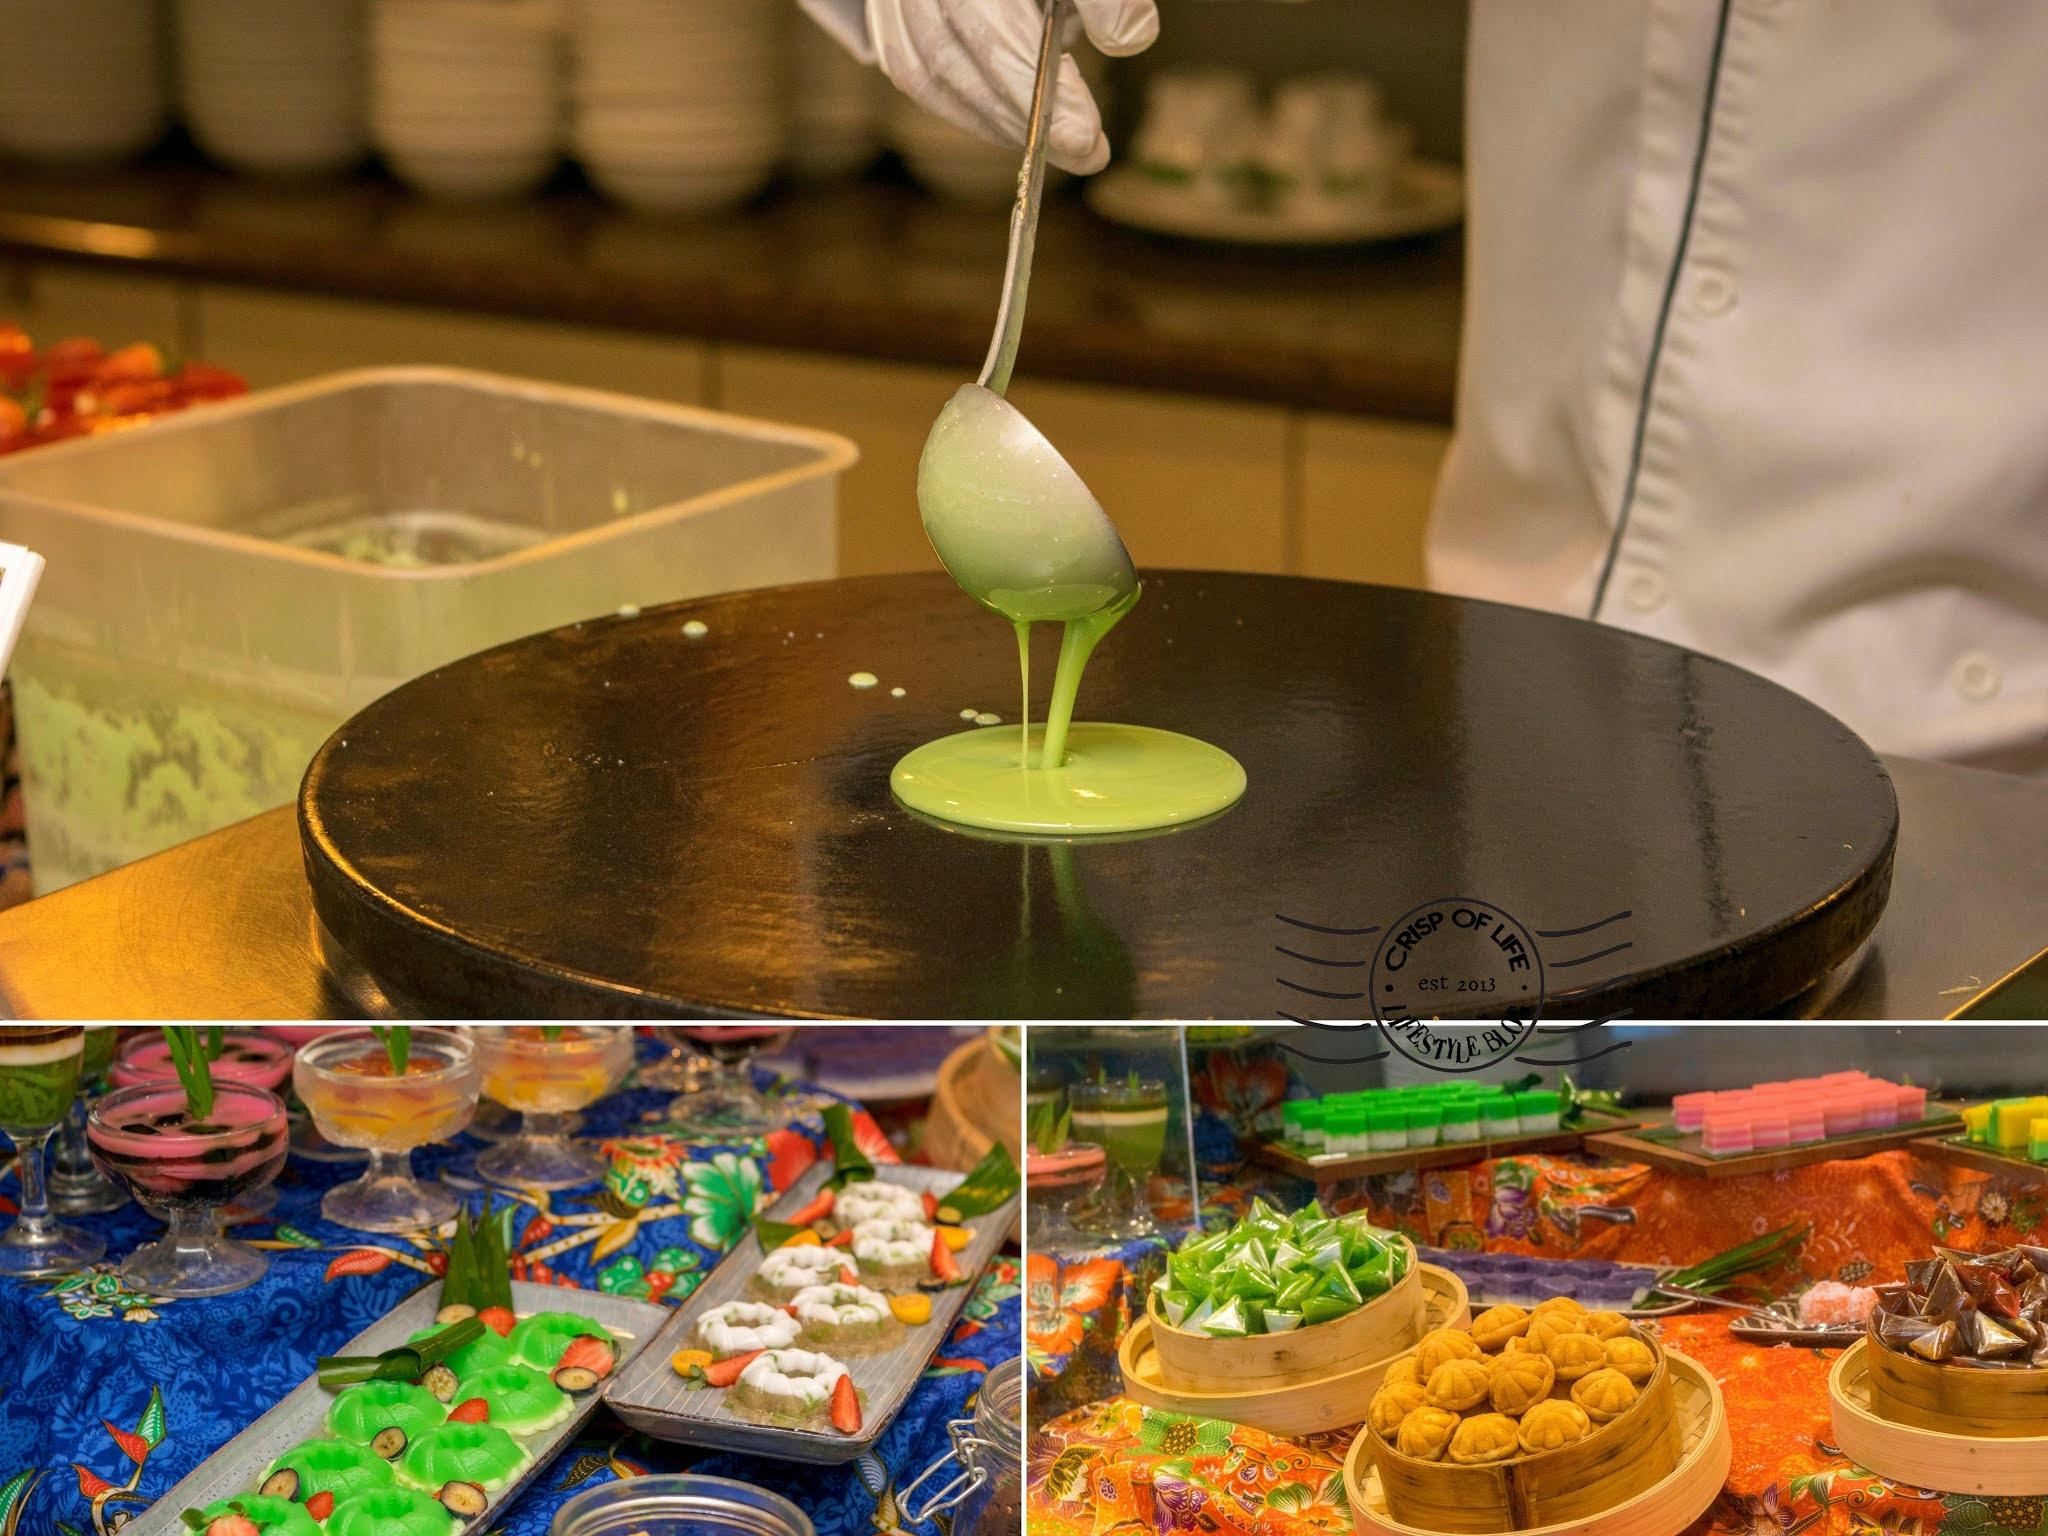 Eat-All-You-Can Selera Kampung Buy 1 Free 1 Every Sunday - Thursday RM 64 nett per adult @ Golden Sands Resort, Penang